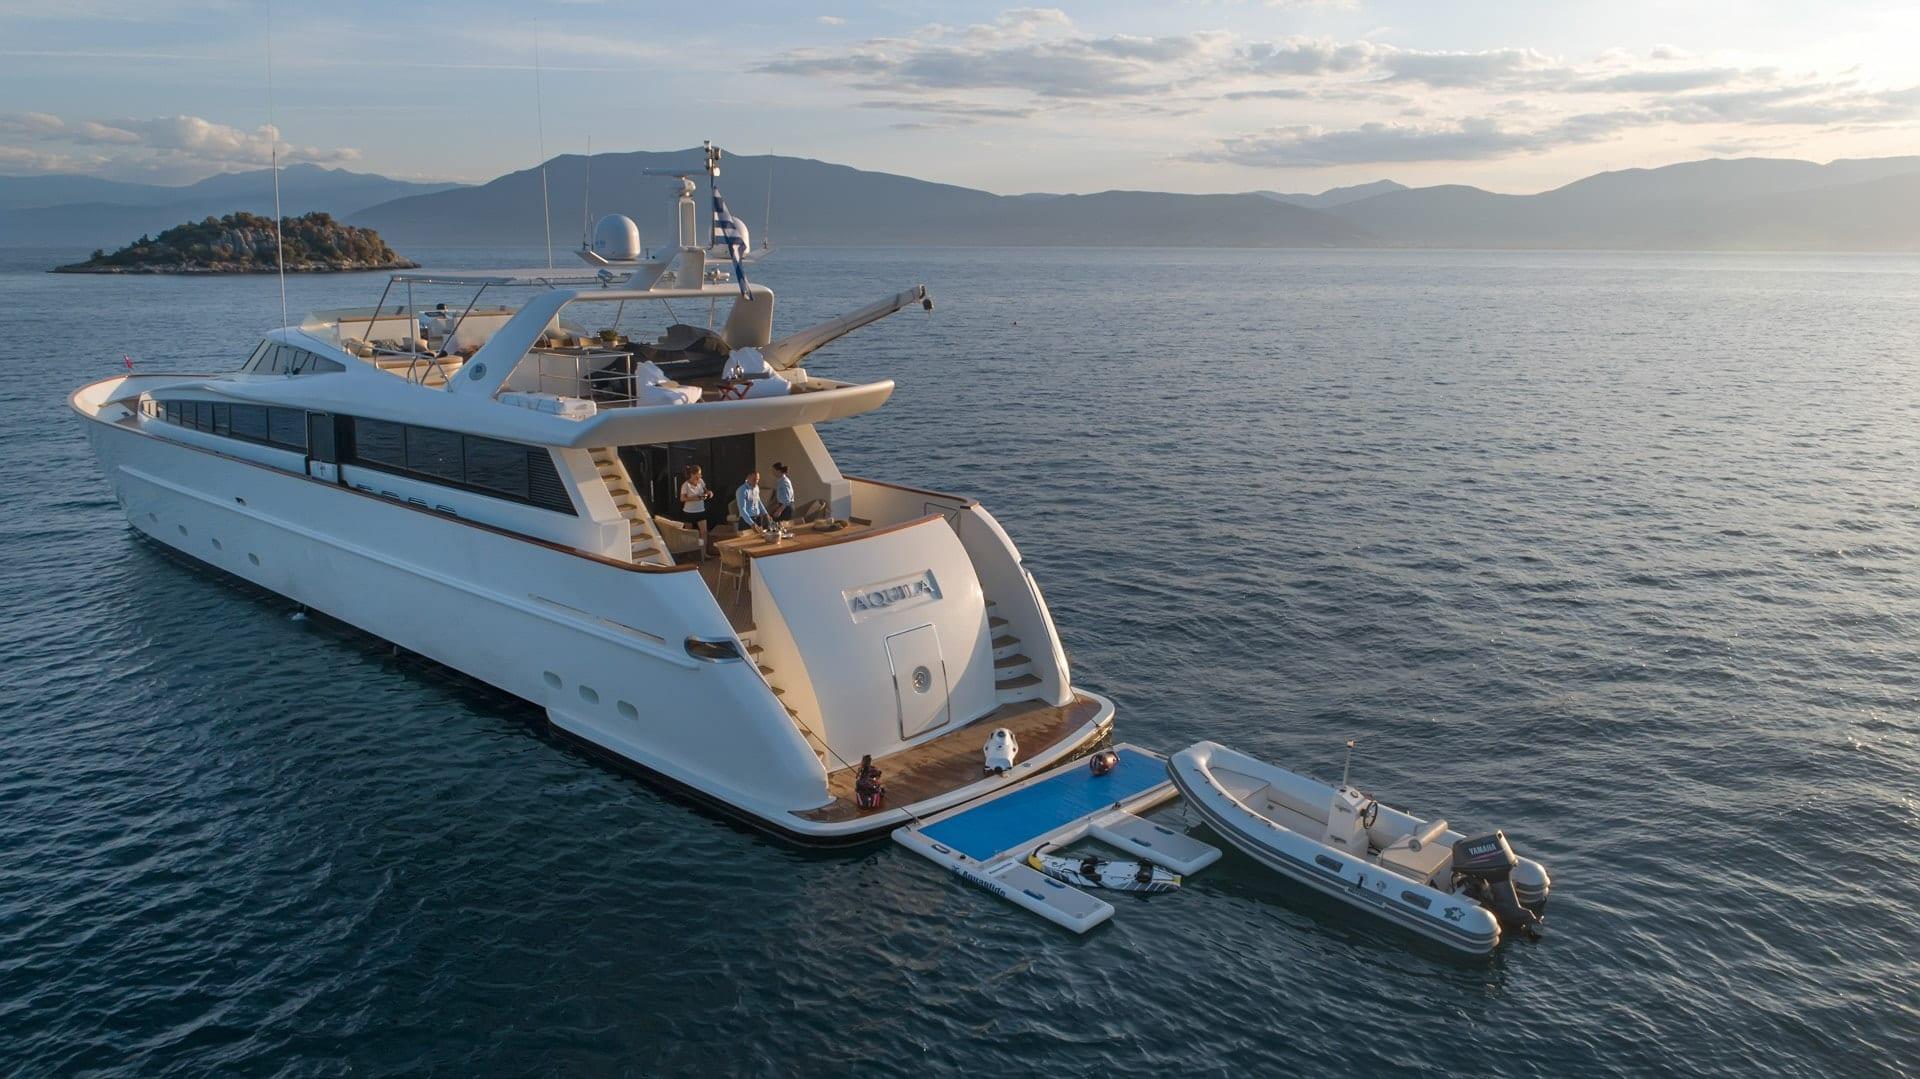 aquila motor yacht exterior profiles (5) min -  Valef Yachts Chartering - 1012